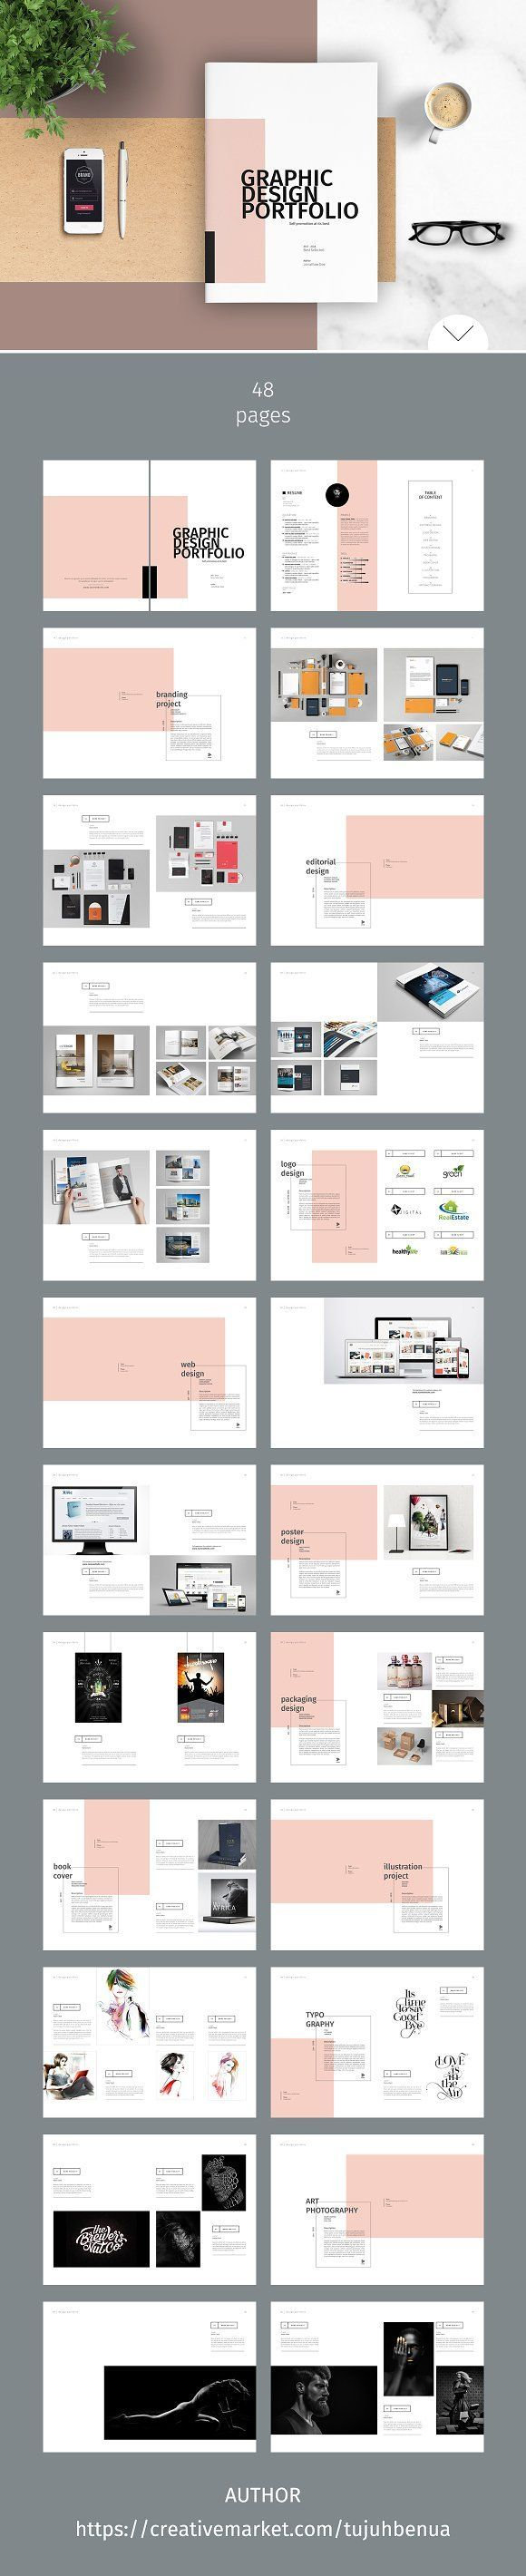 graphic design portfolio template by tujuhbenua on creativemarket - Bewerbung Grafikdesign